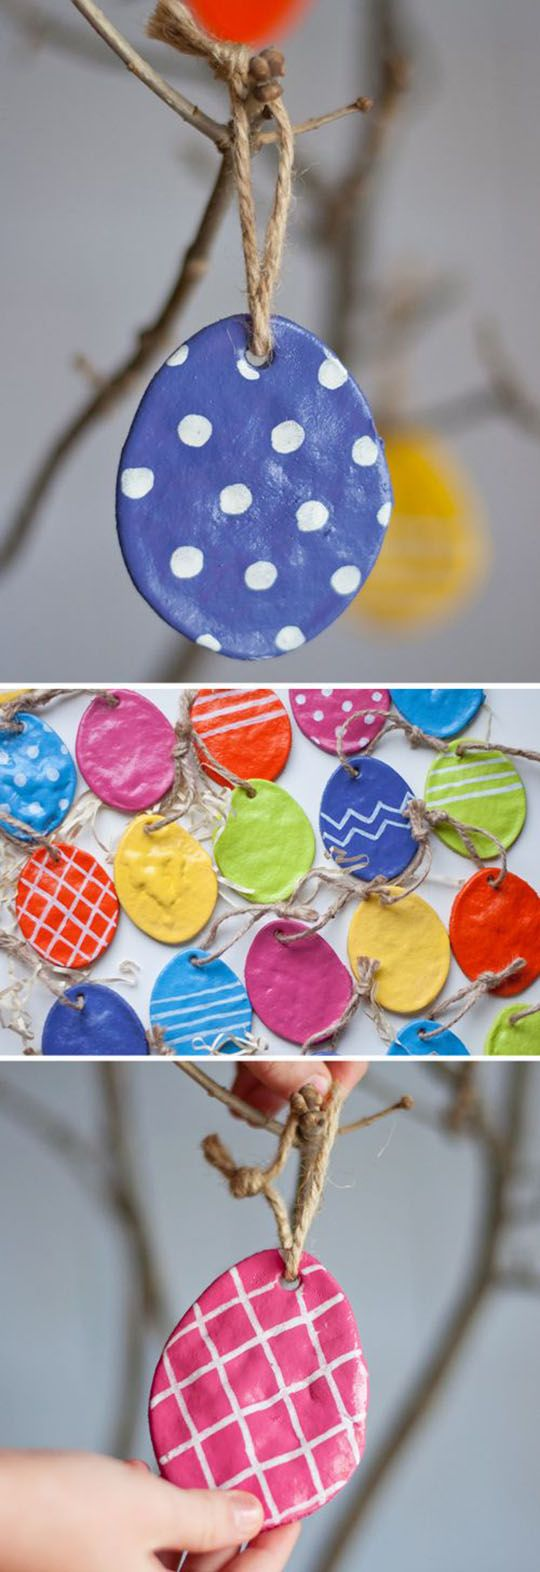 Salt Dough Eggs | DIY & Crafts Tutorials